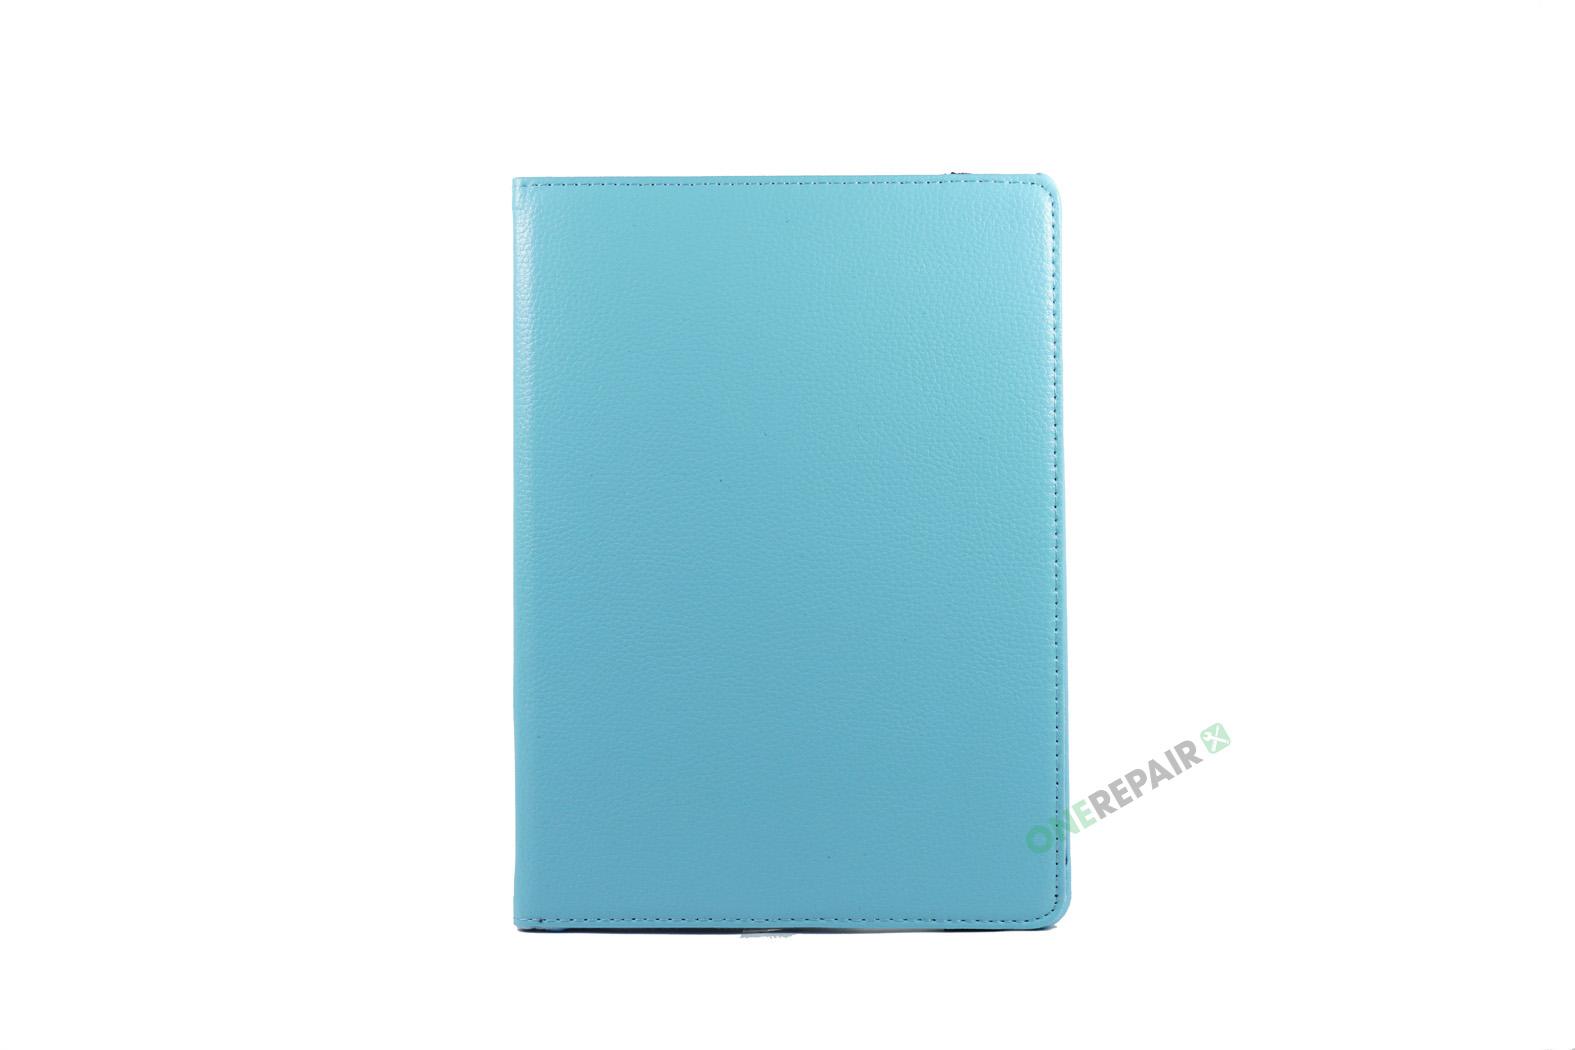 351054_iPad_Air2_2_A1566_A1567_Flipcover_Cover_Lyseblaa_Blaa_OneRepair_00002